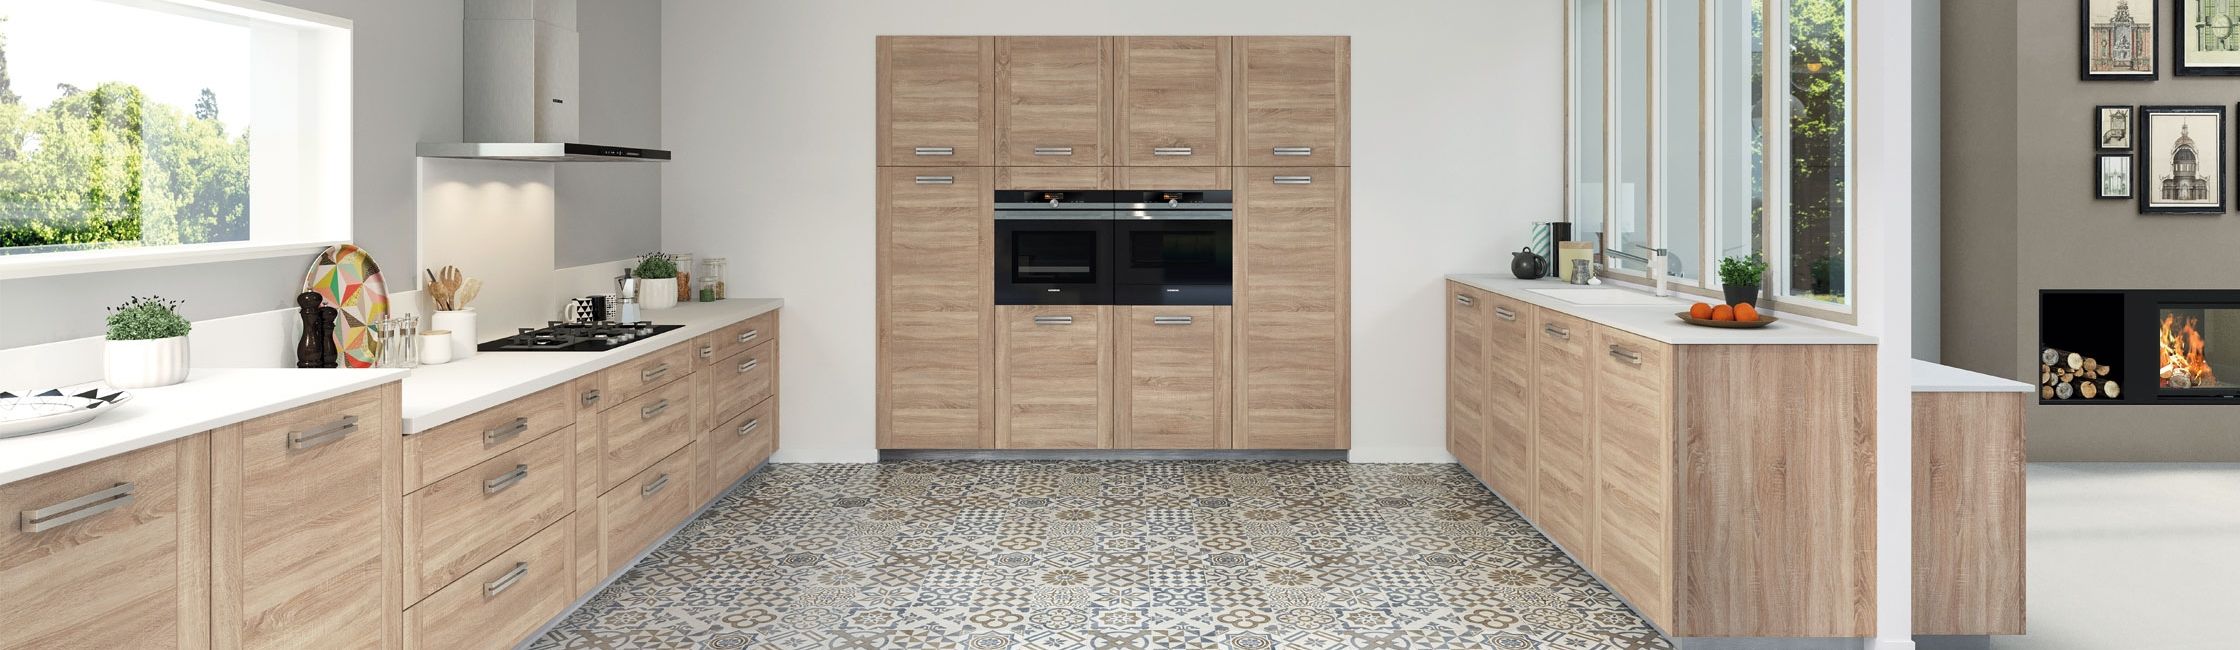 comment bien optimiser votre cuisine comera cuisines. Black Bedroom Furniture Sets. Home Design Ideas